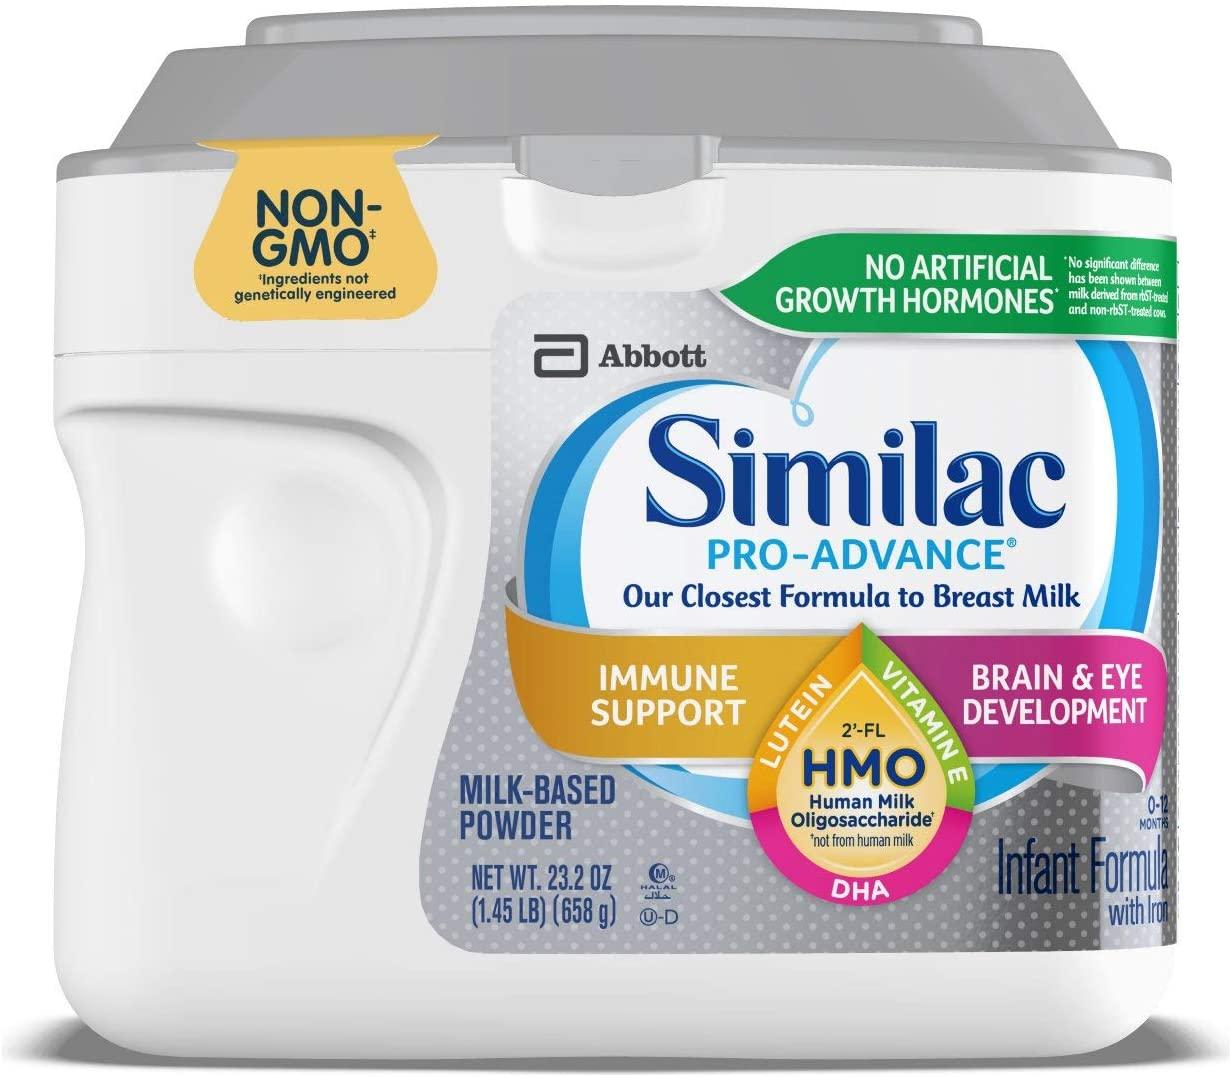 Similac Pro-Advance Non-GMO Infant Formula - 23.2 Ounce